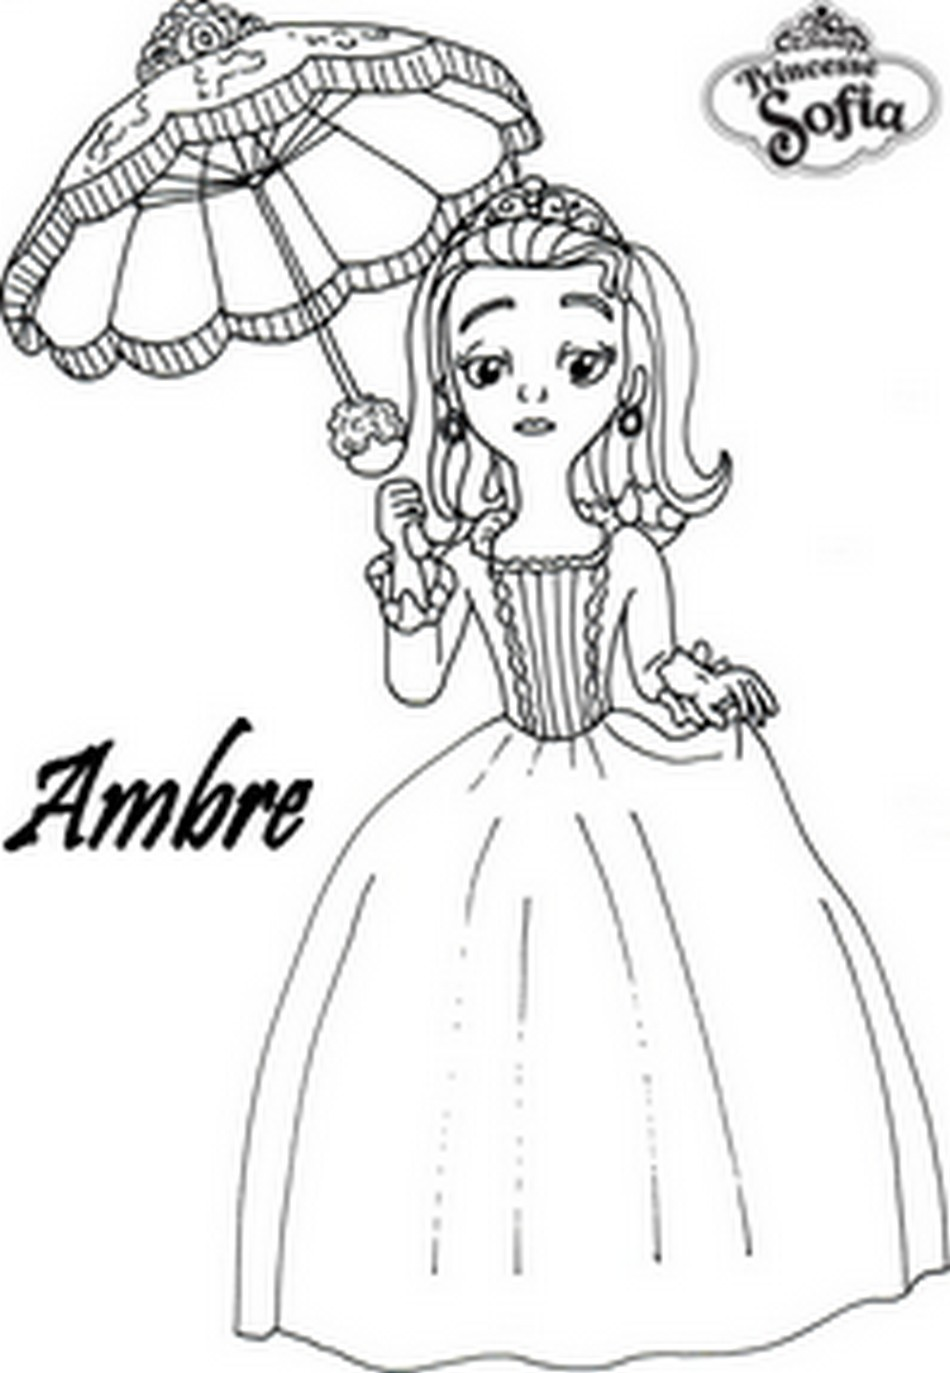 Coloriage a imprimer princesse sofia ambre gratuit et colorier - Coloriage princesse ambre ...